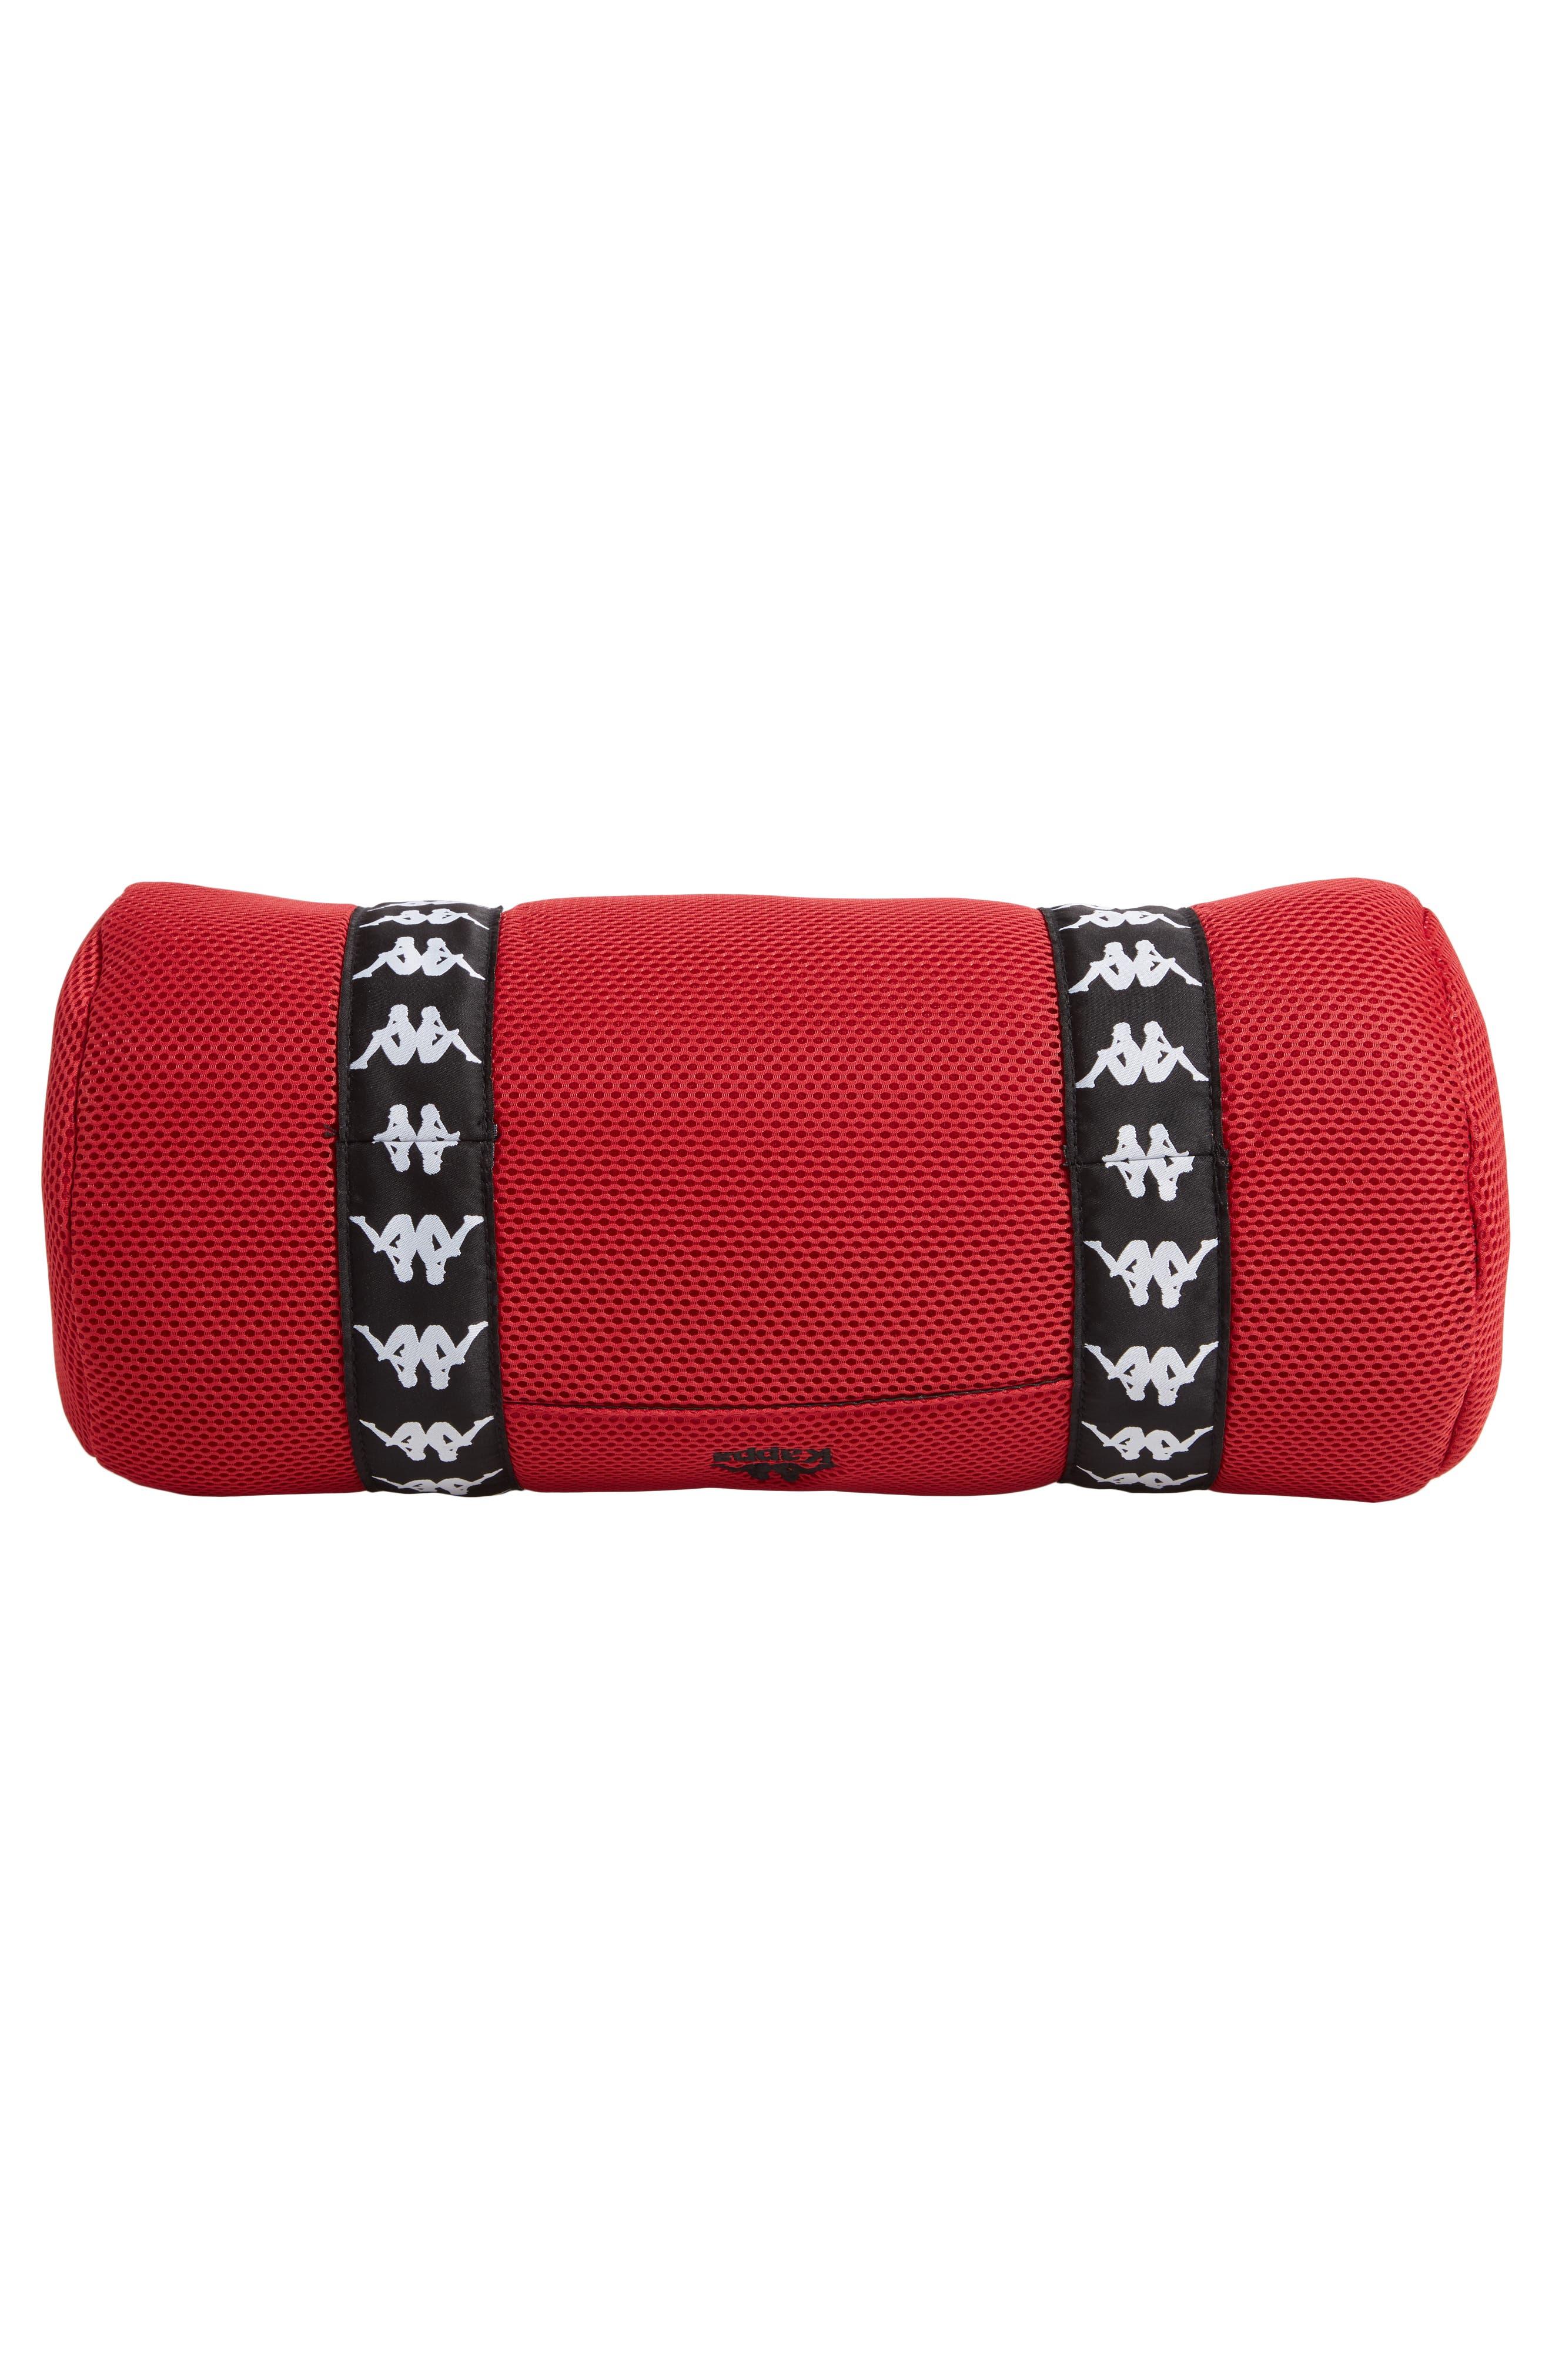 Large Mesh Athletic Duffel Bag,                             Alternate thumbnail 6, color,                             RED DK-BLACK-WHITE